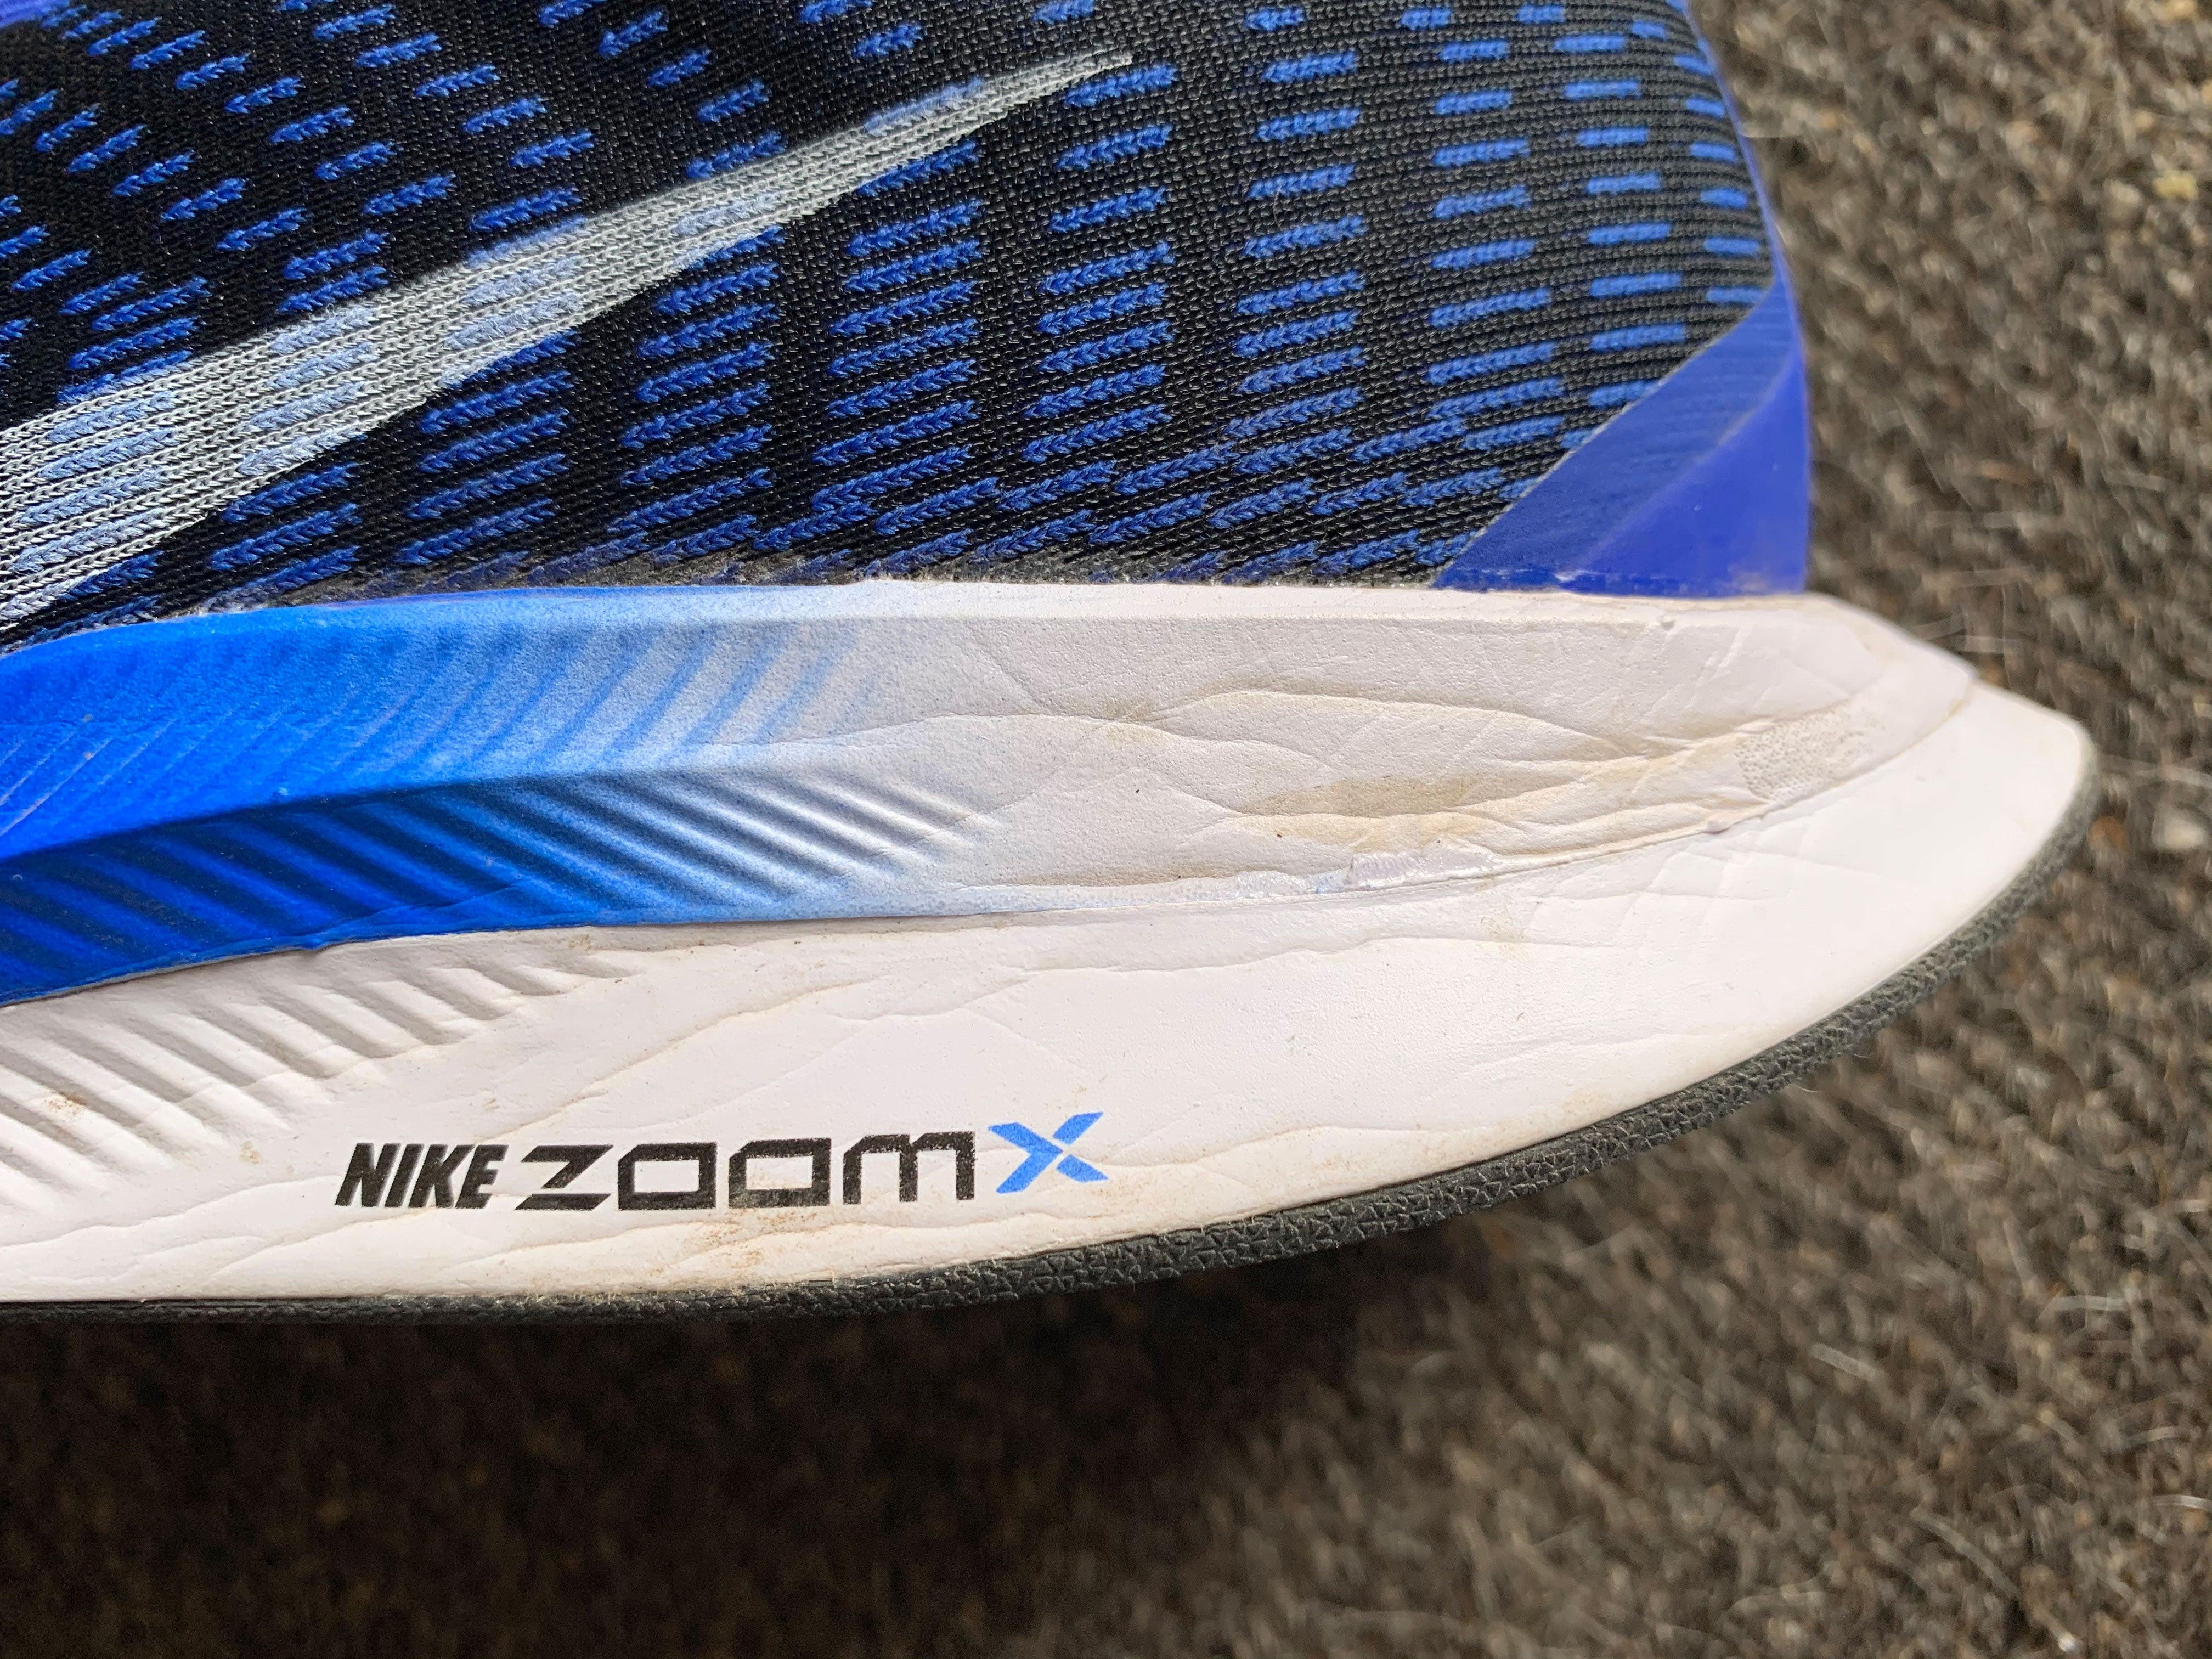 Nike ZoomX midsole